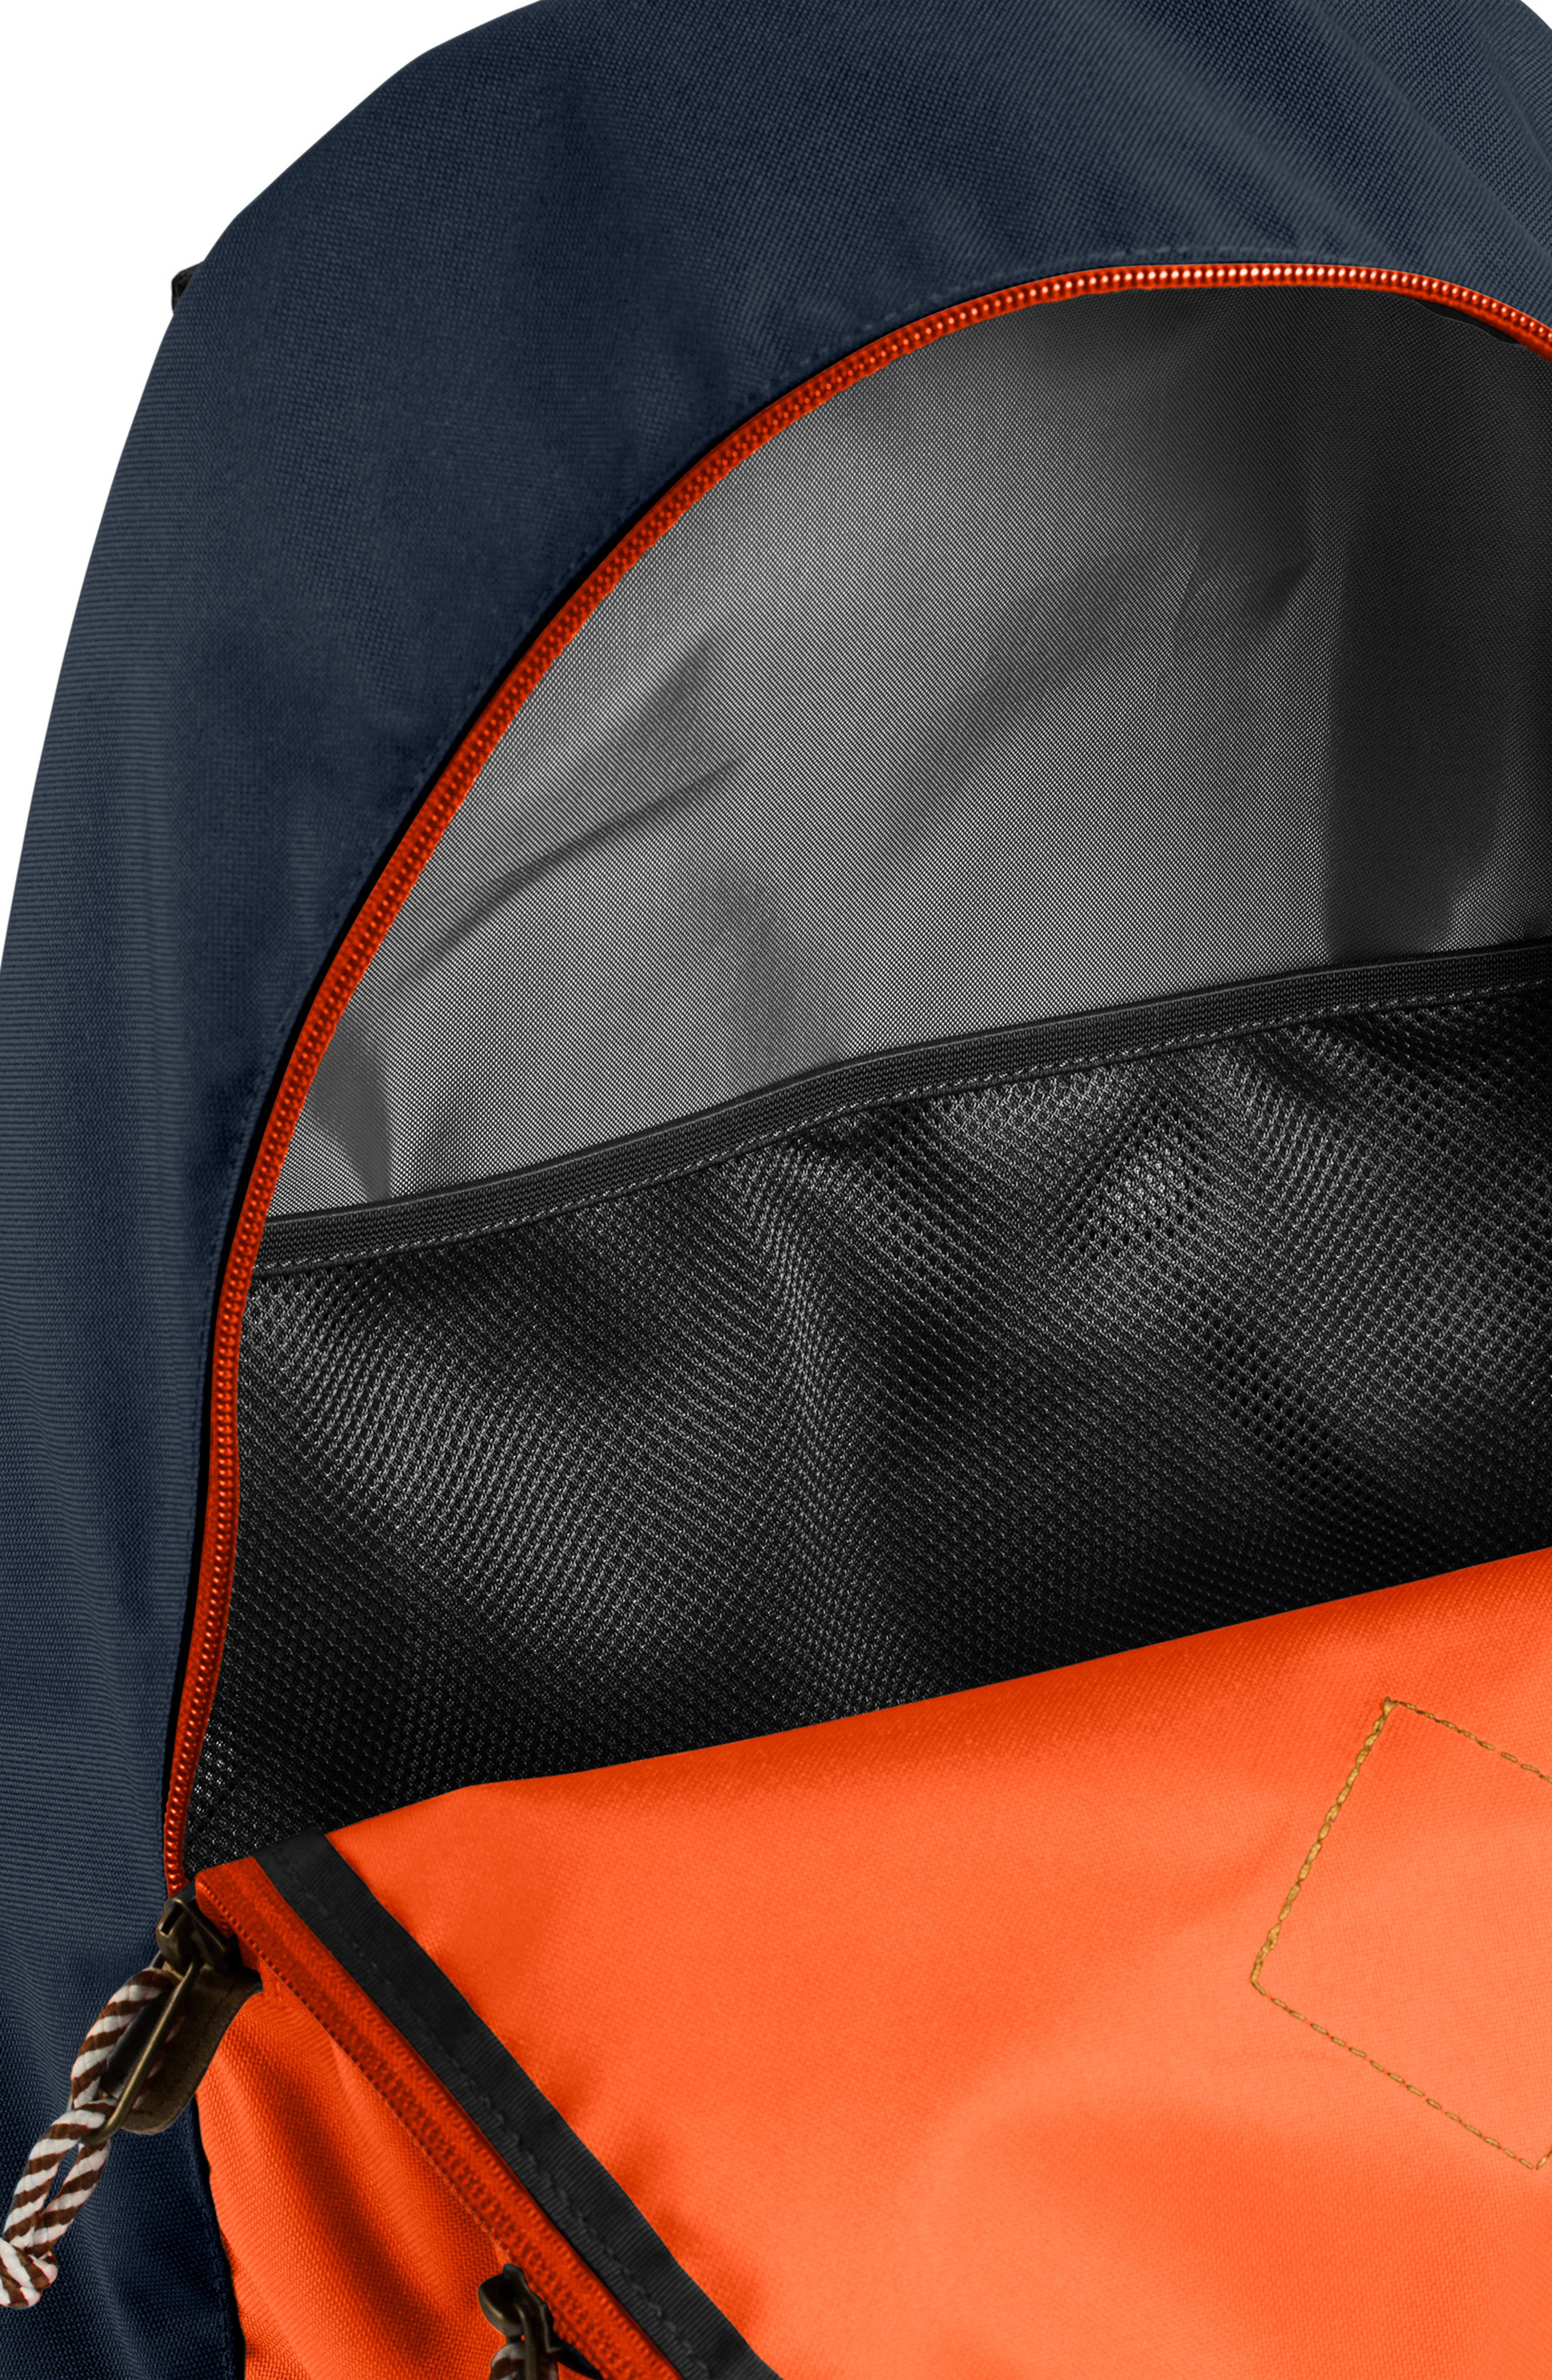 THE NORTH FACE,                             Berkeley 25-Liter Backpack,                             Alternate thumbnail 3, color,                             URBAN NAVY/PERSIAN ORANGE